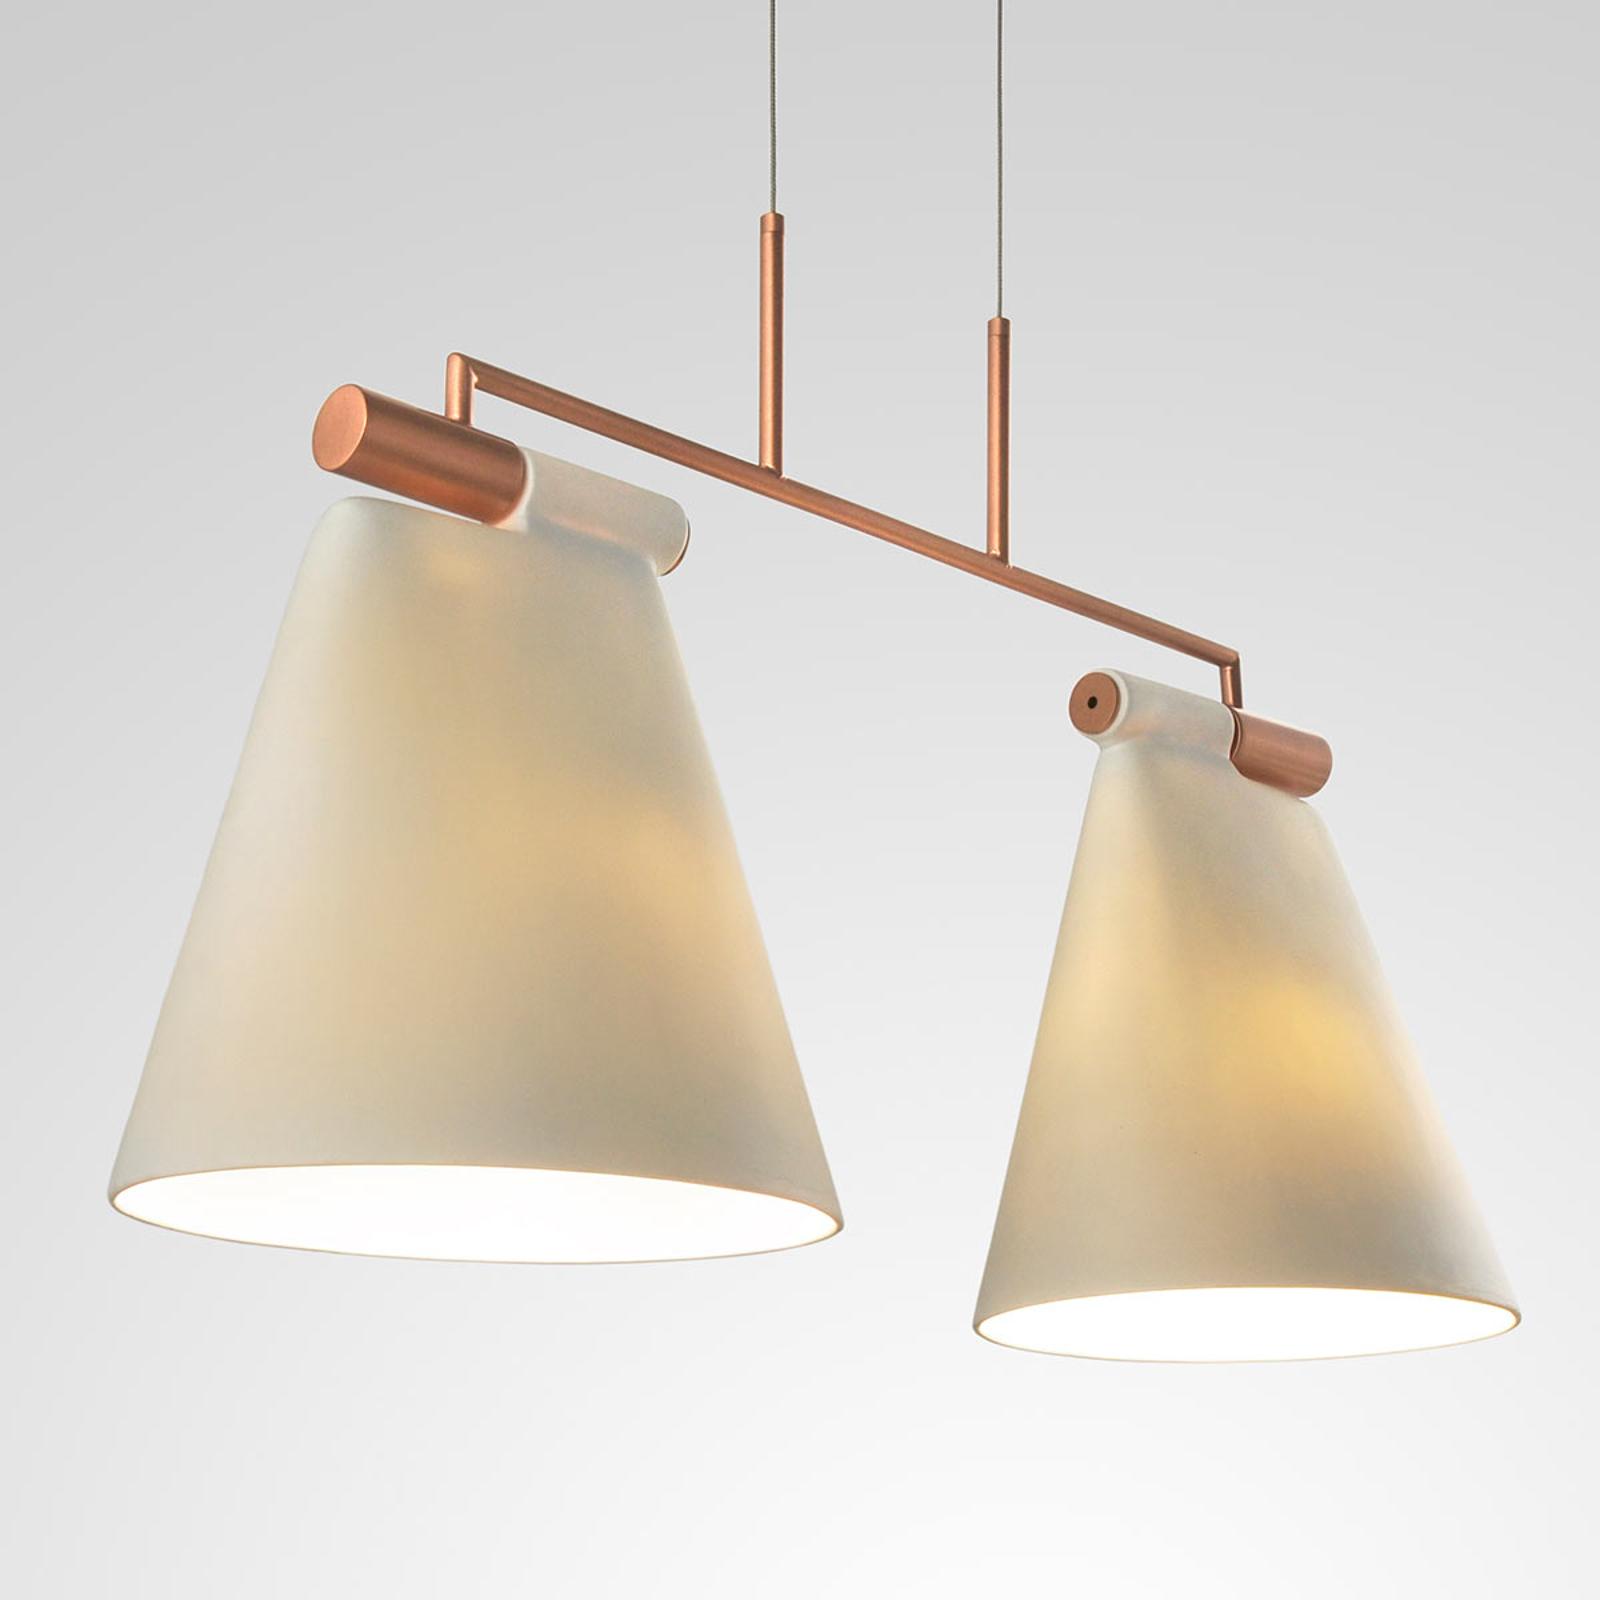 Lampa wisząca Cone Light S2, 2-punktowa